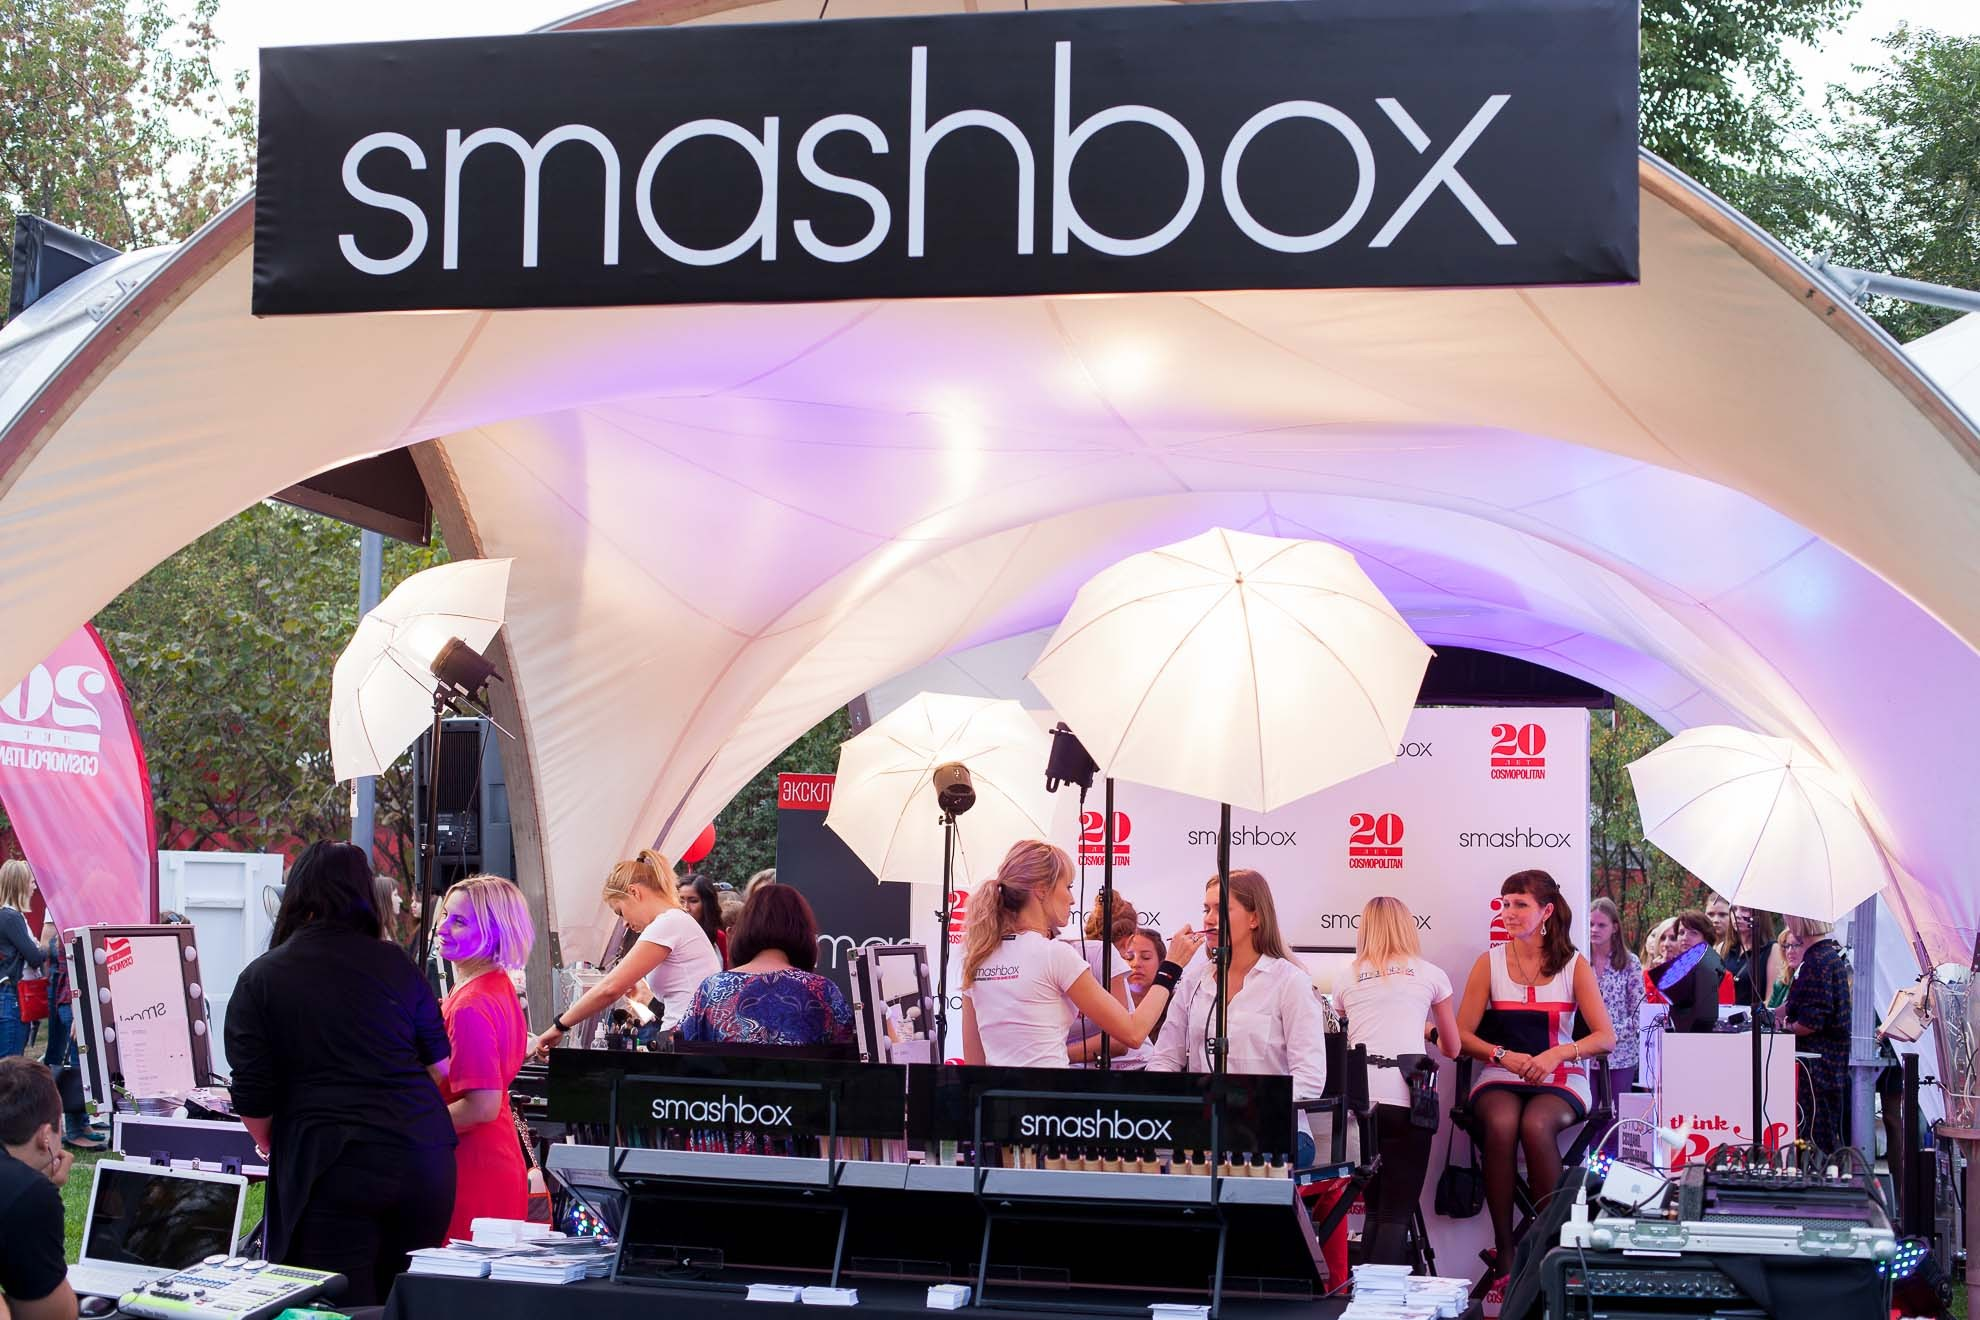 SMASHBOX COSMOPOLITAN 20 лет, парк Музеон, Москва